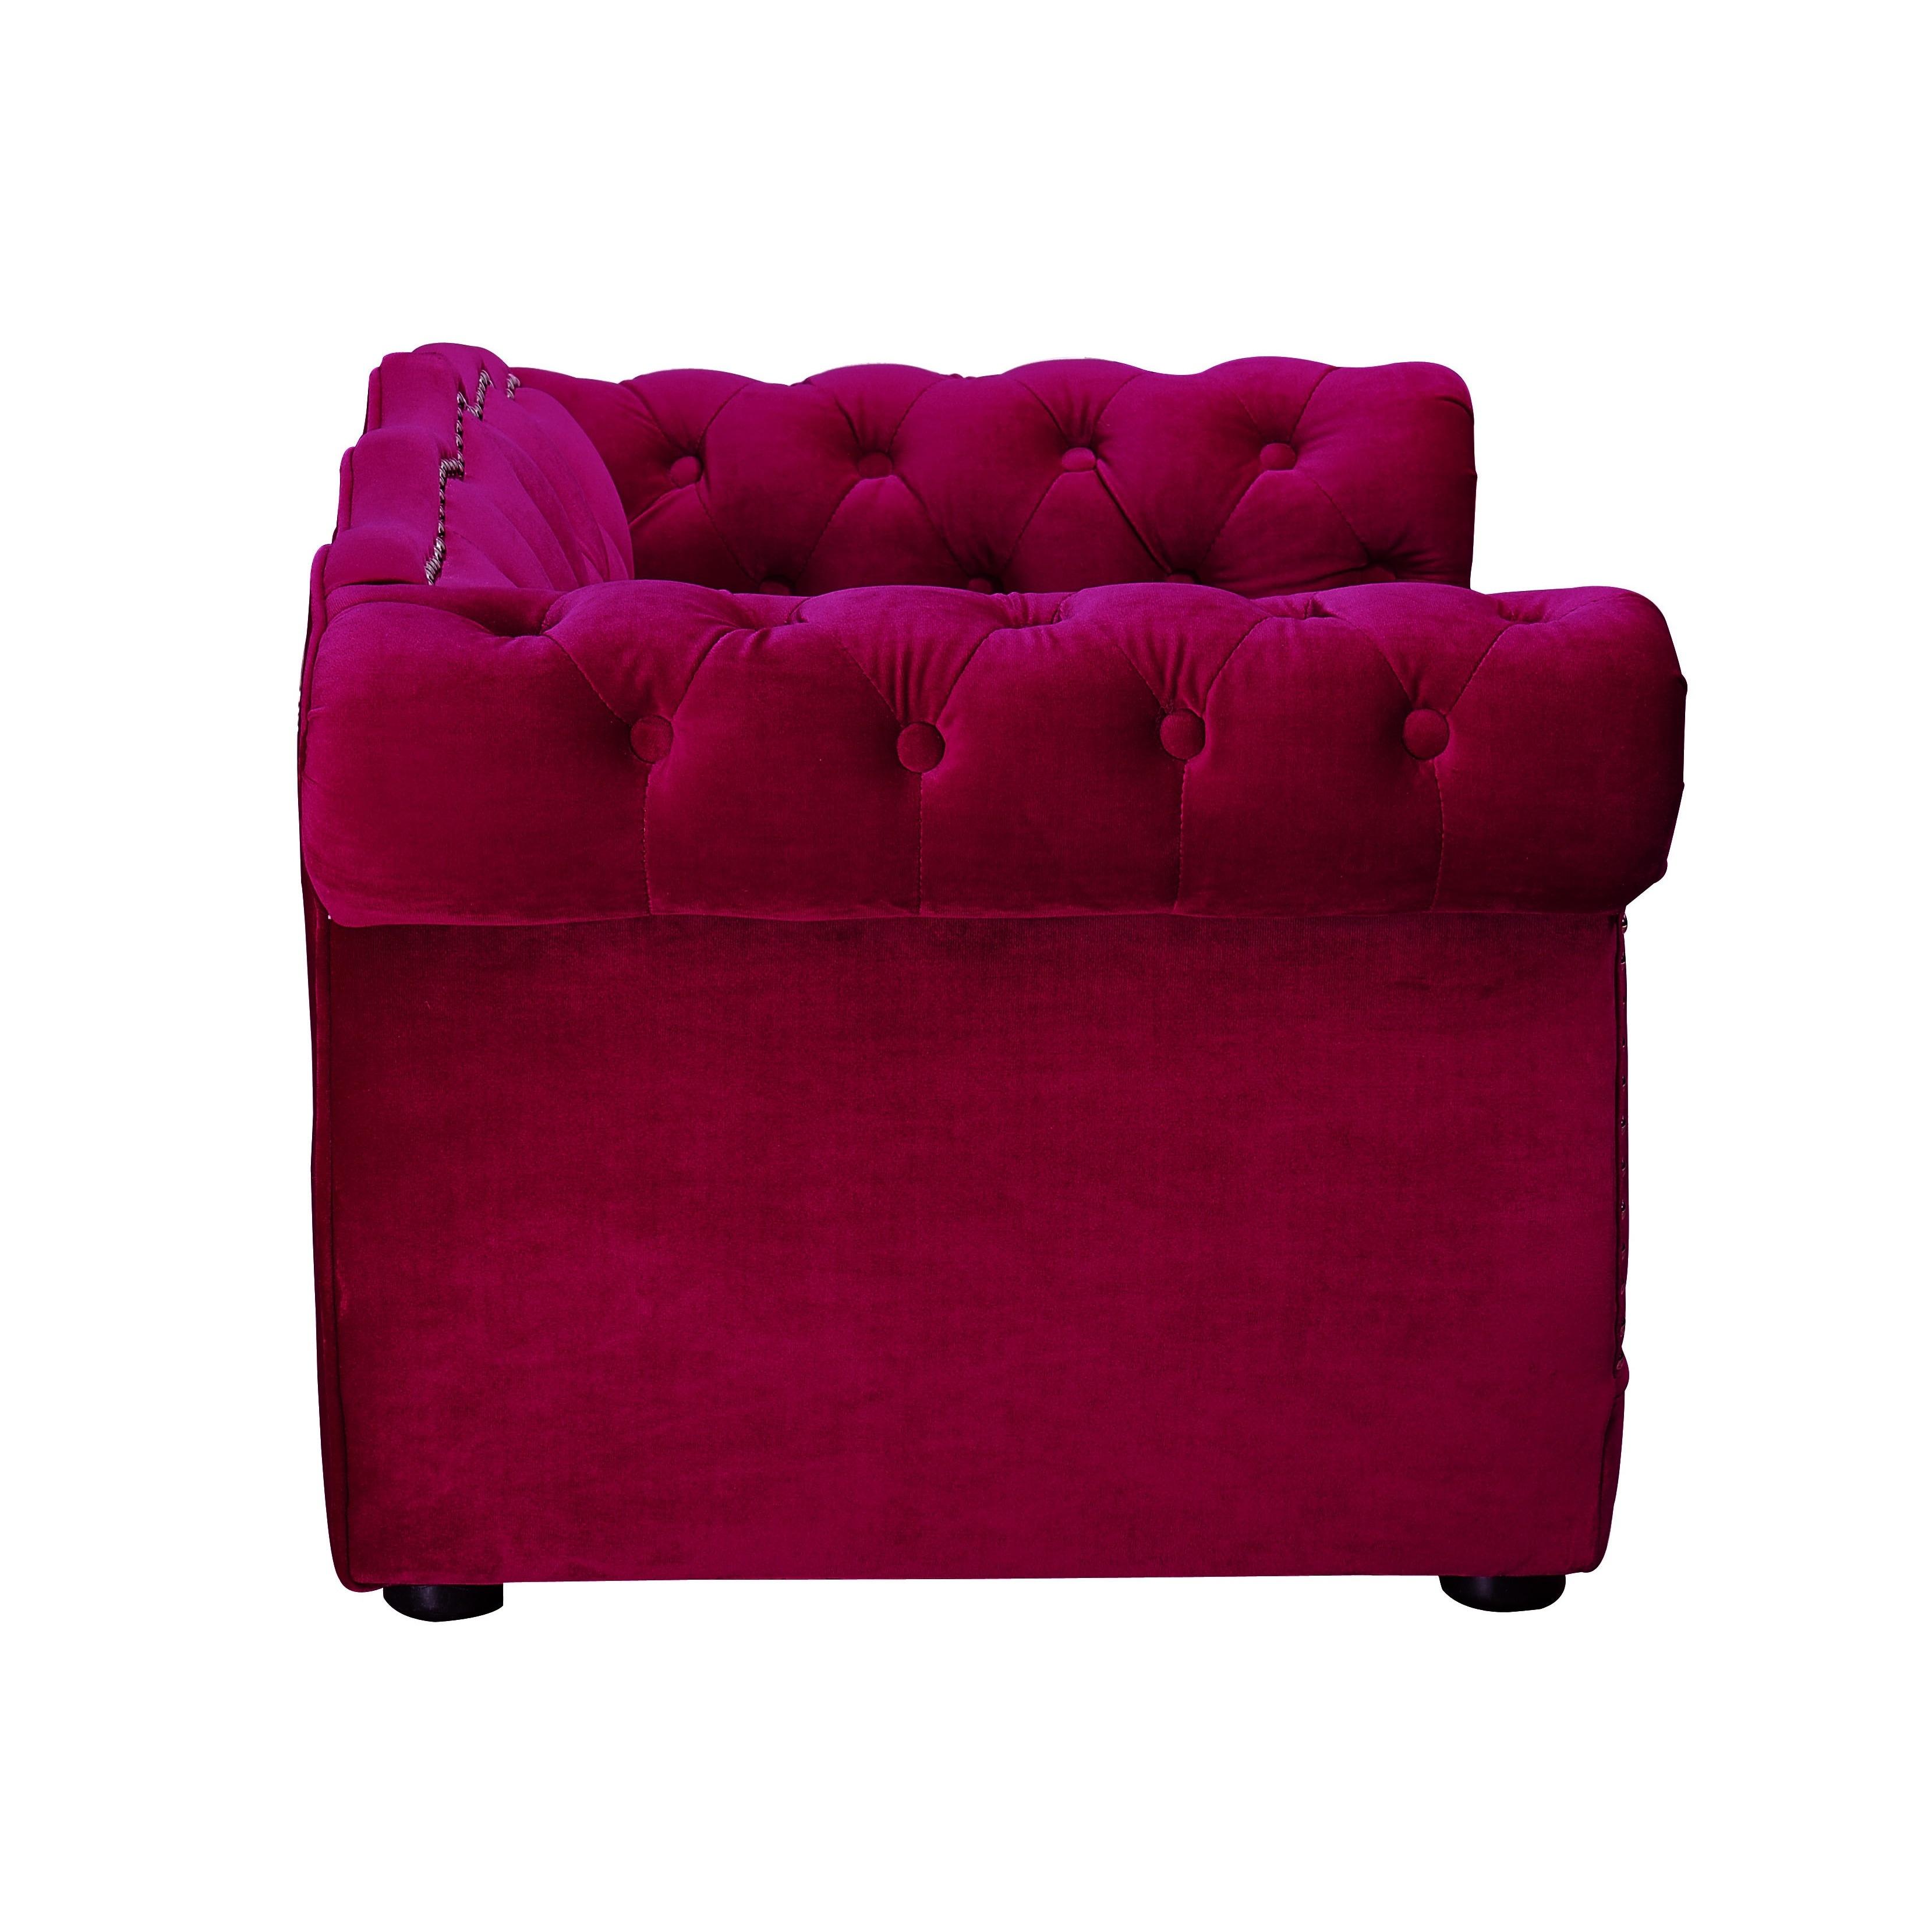 shop yorkshire pink velvet wood button tufted pet bed free